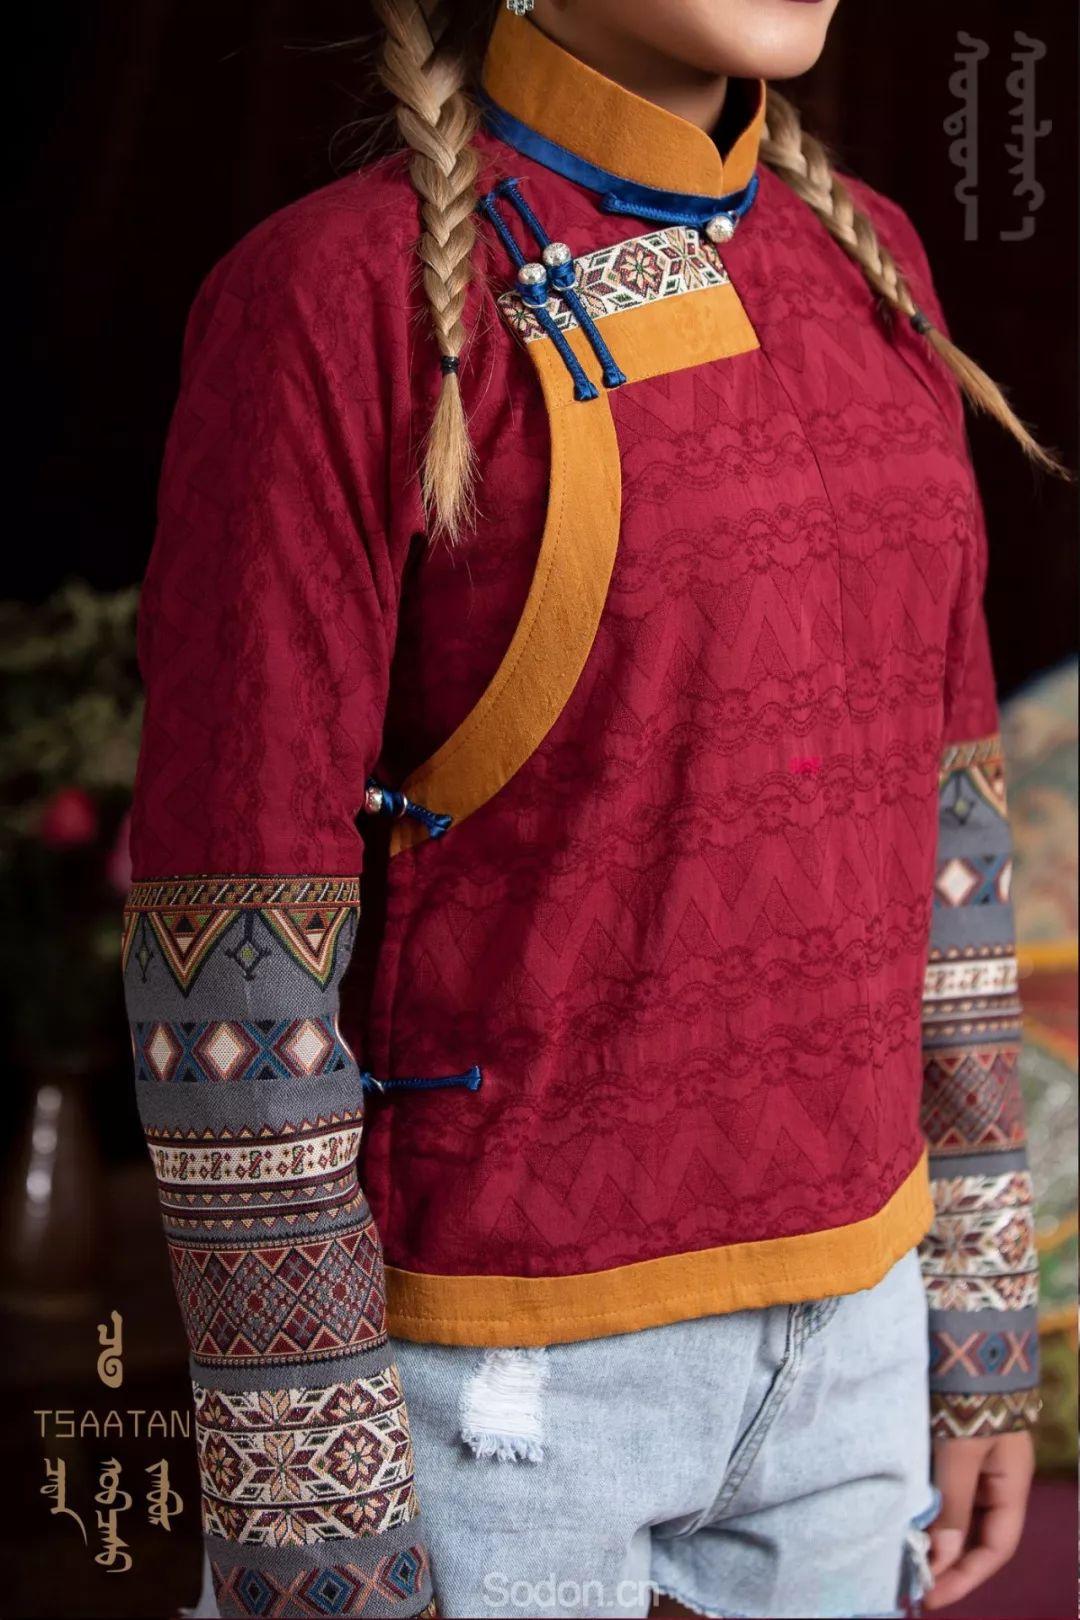 TSAATAN蒙古时装秋冬系列,来自驯鹿人的独特魅力! 第40张